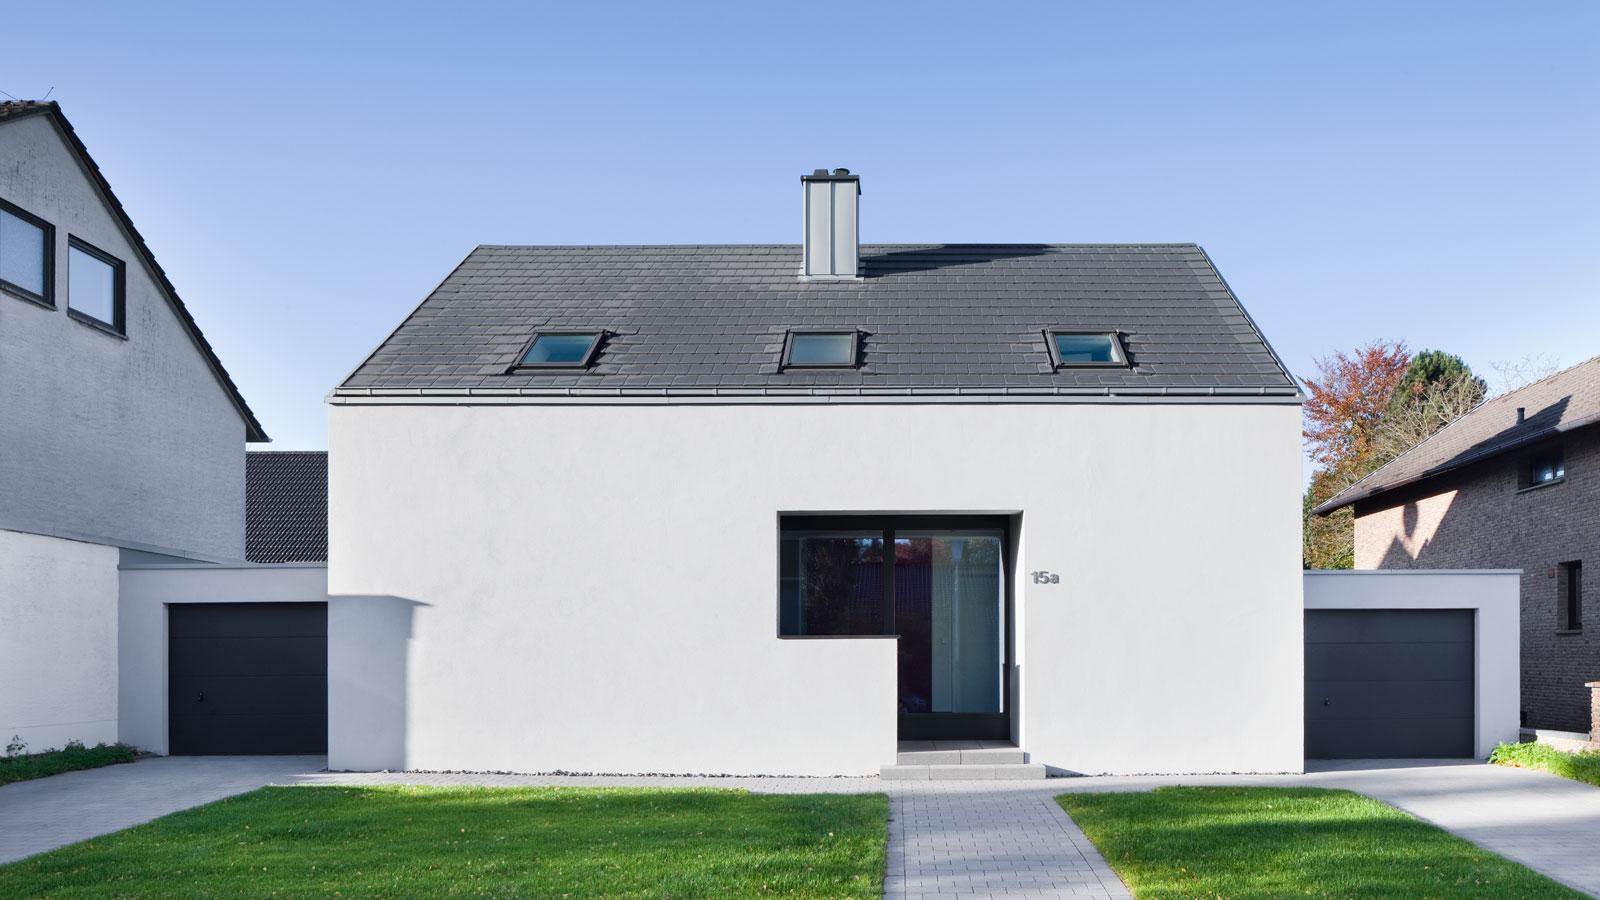 Einfamilienhaus Kohlbergweg Neubau Einfamilienhaus, Koenigs Rütter Architket